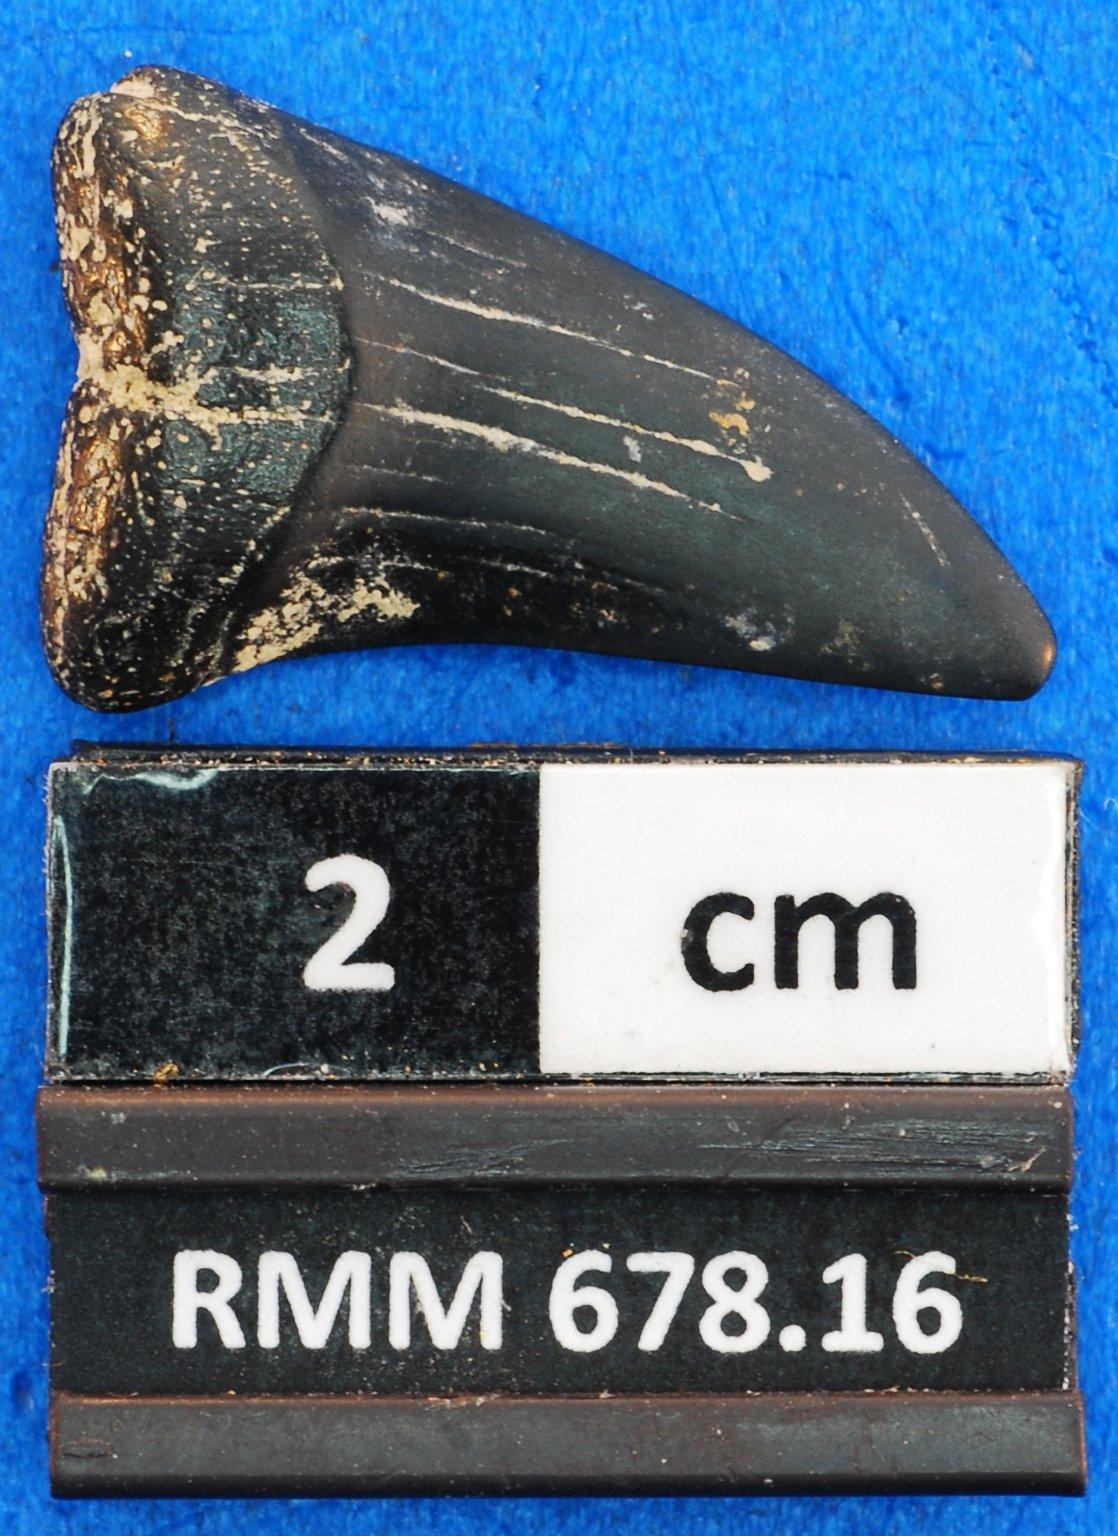 cf. Jaekelotodus sp.